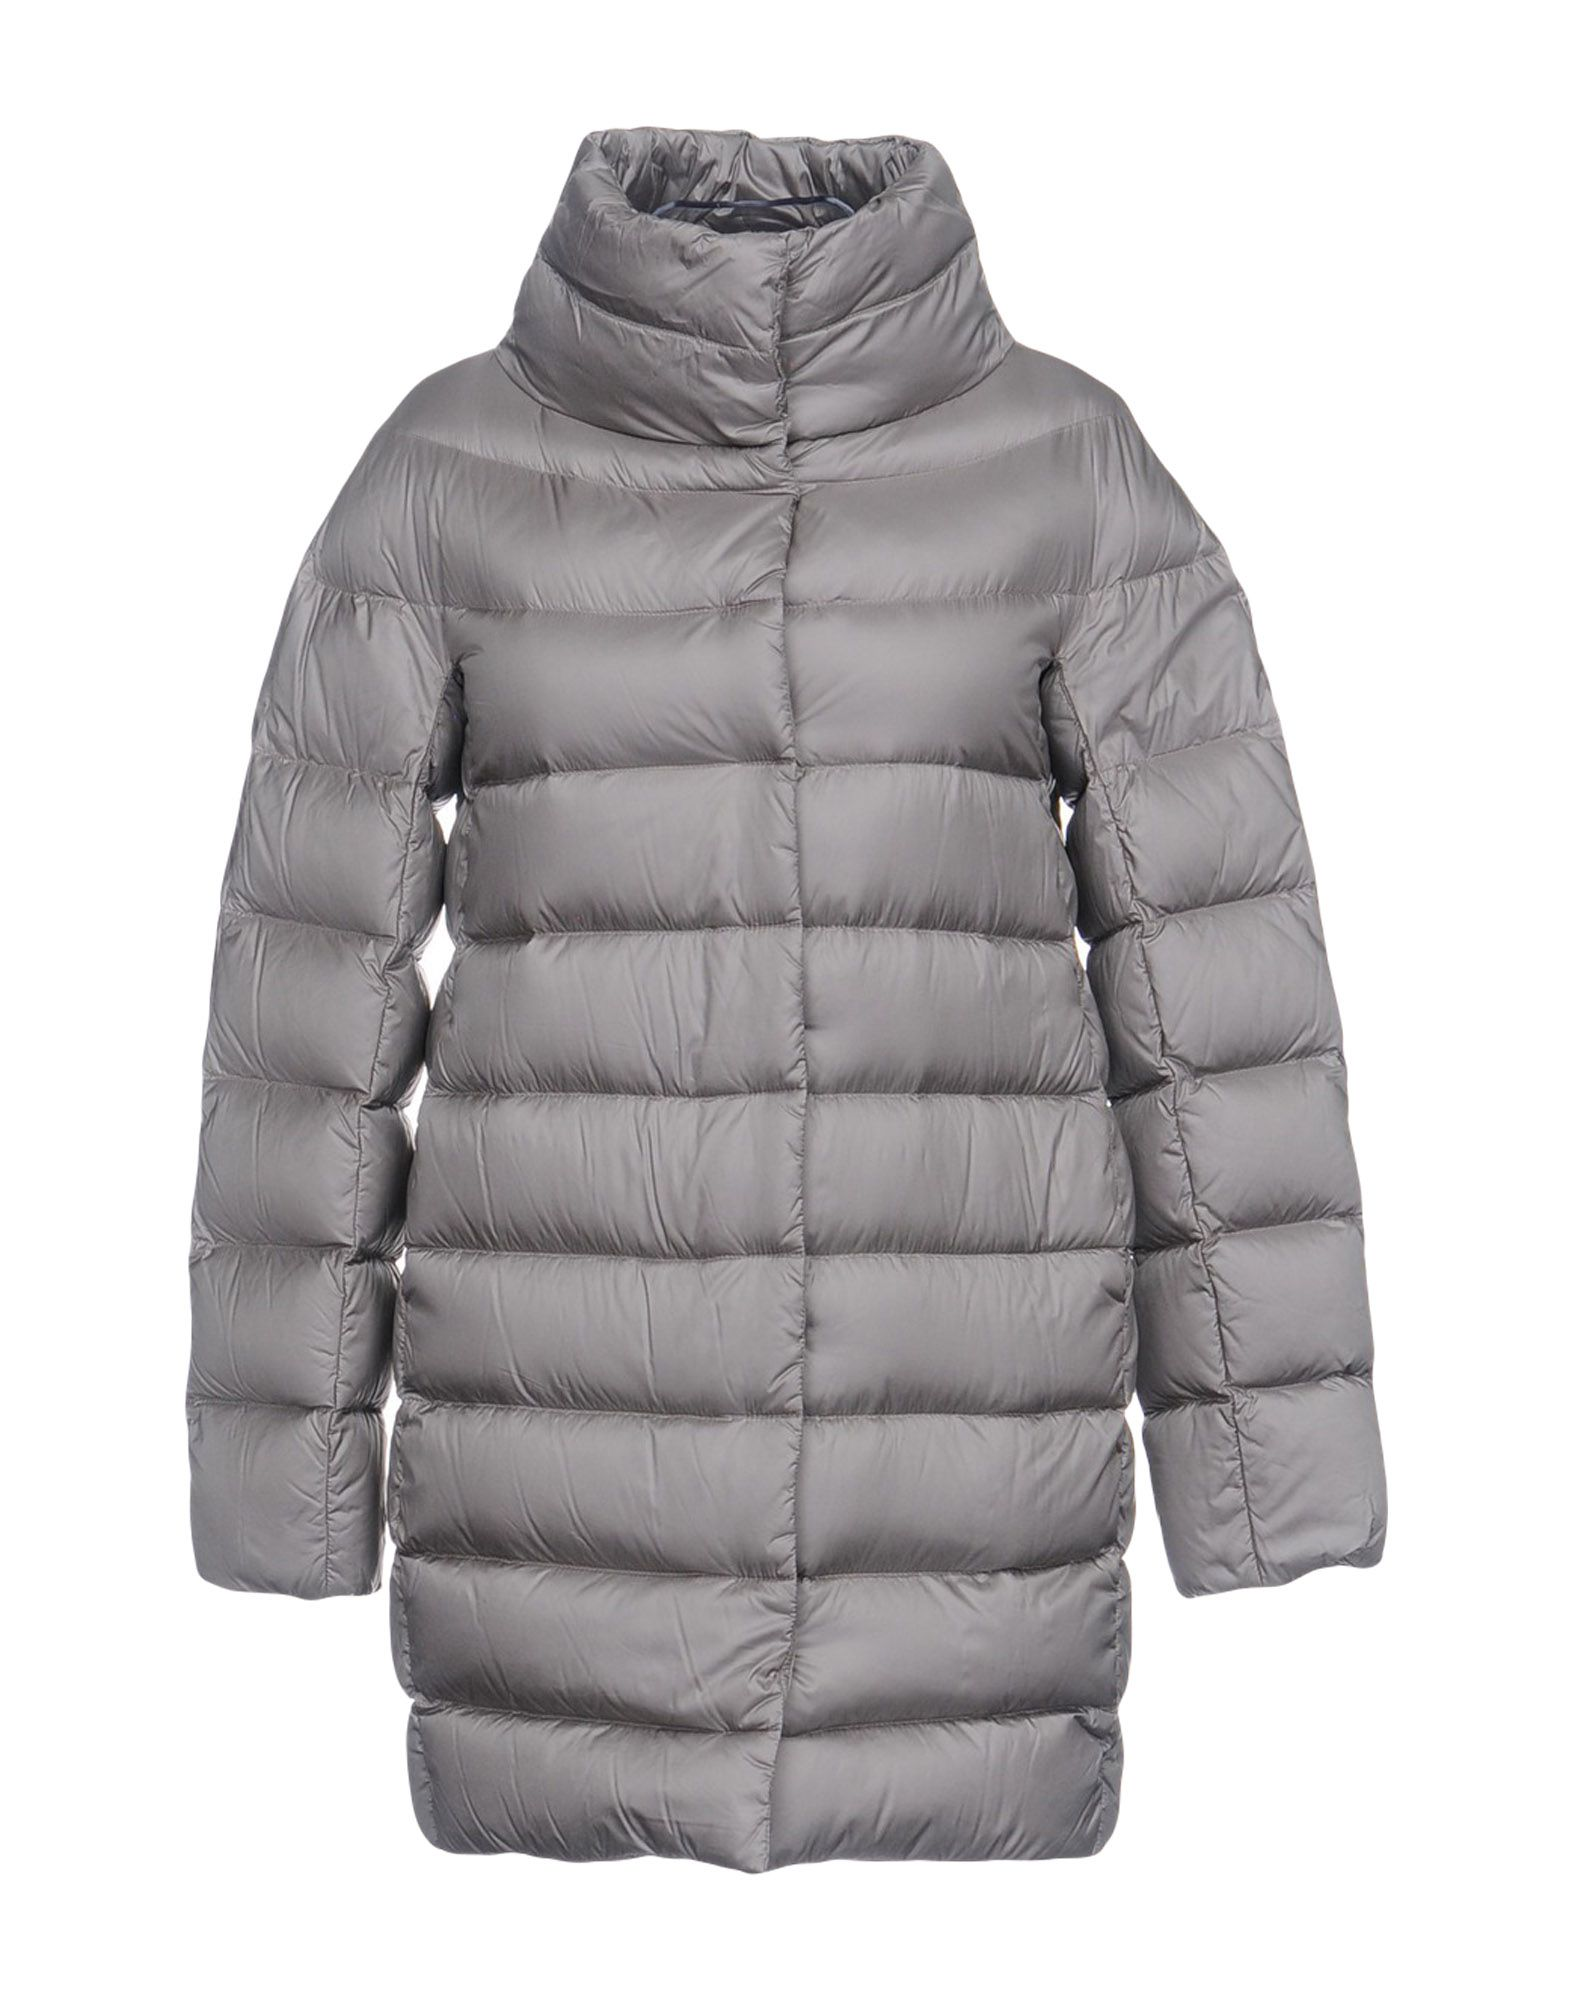 detailed look 9ff02 555ba JAN MAYEN Down jacket - Coats & Jackets | YOOX.COM